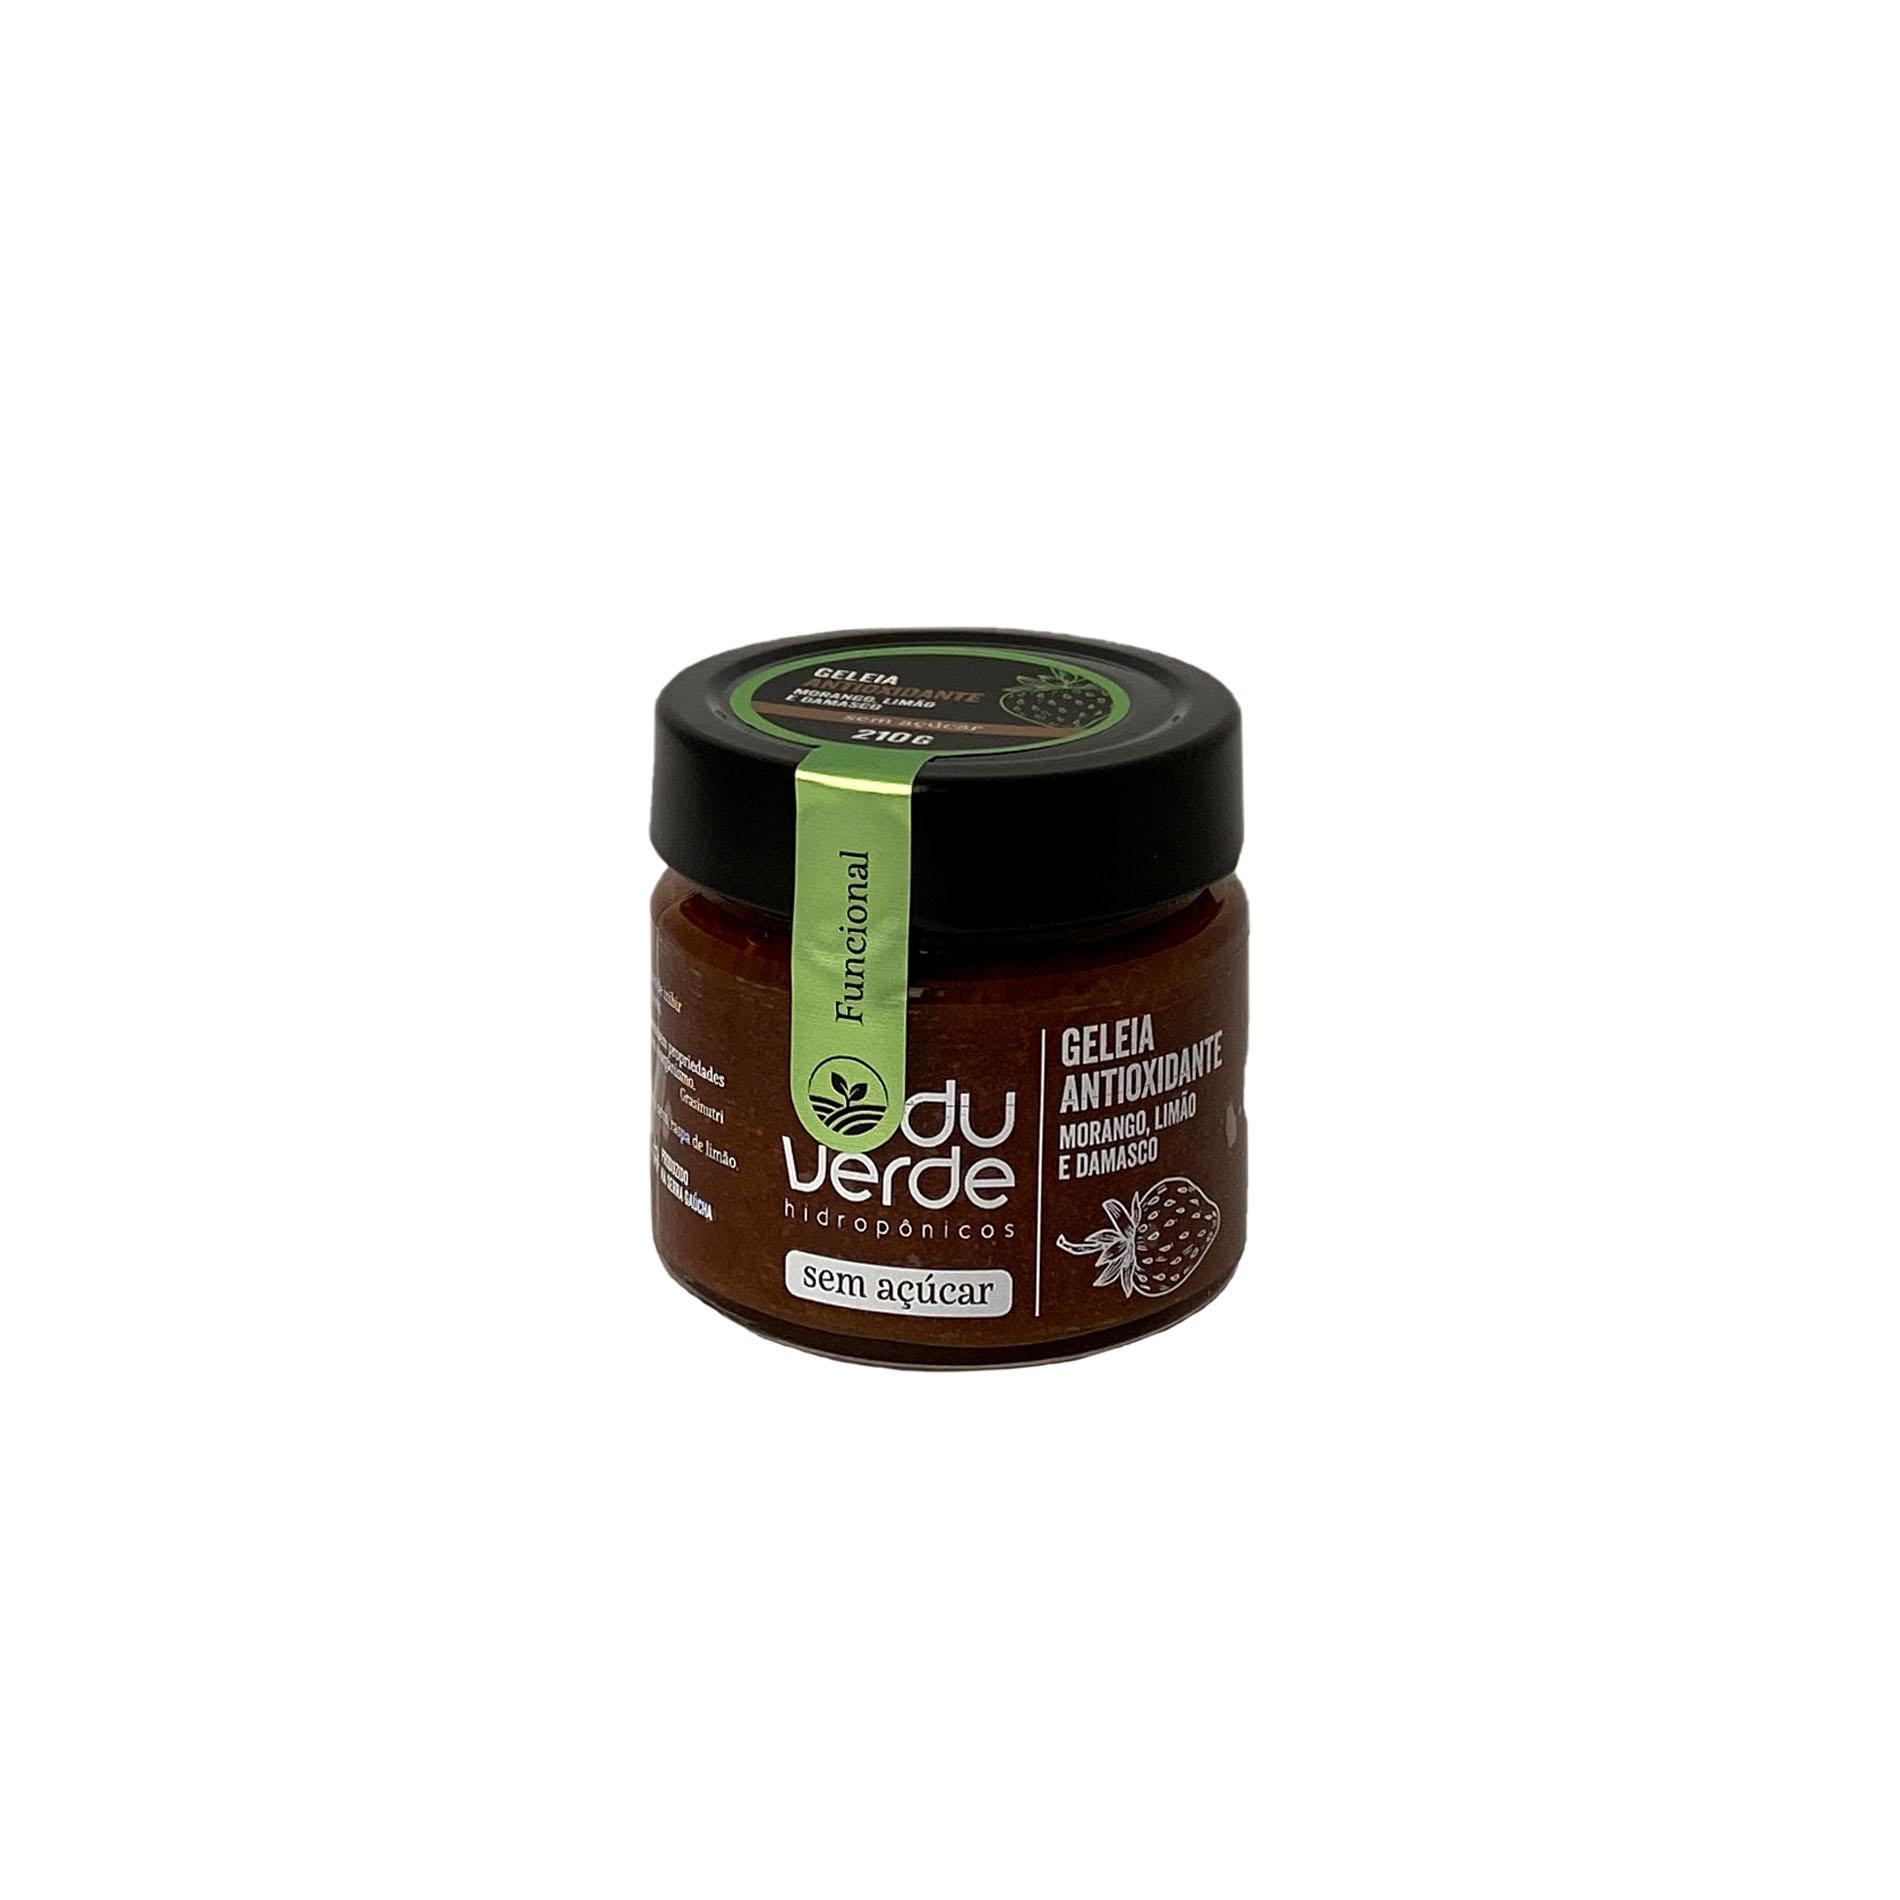 Geleia Antioxidante  - Vinerize